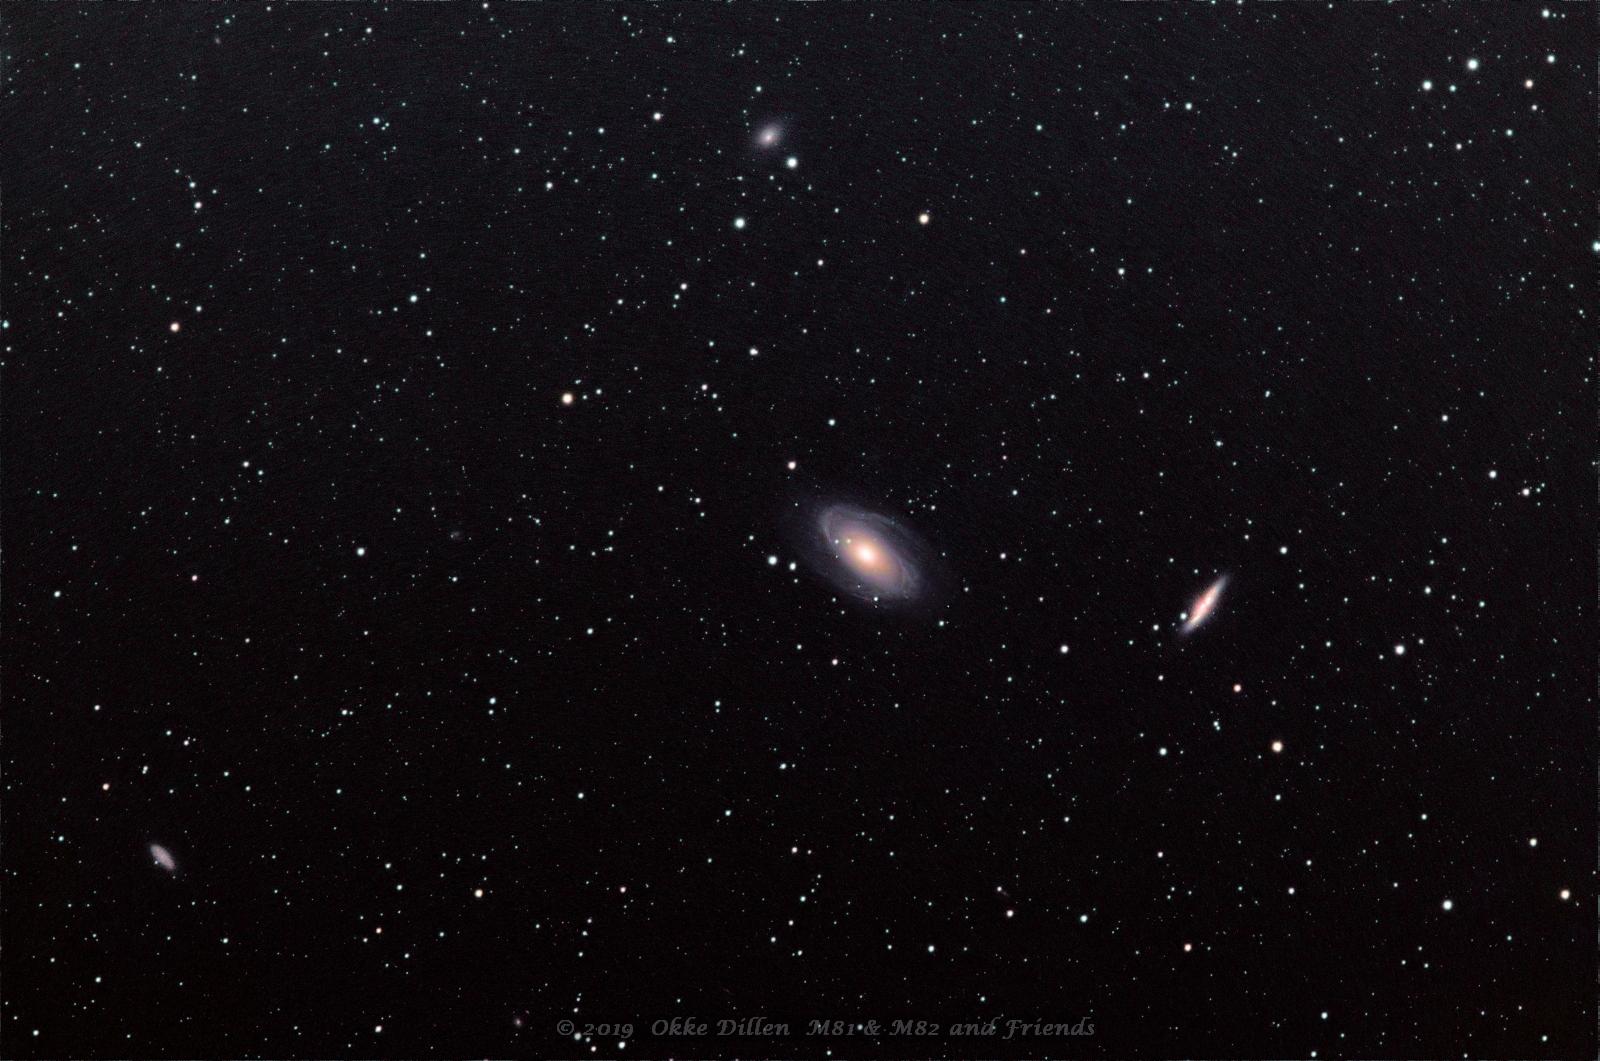 M81+M82+Friends_dss3_hs4_ps2_1600_neat_ps_p2_ps_fc.jpg